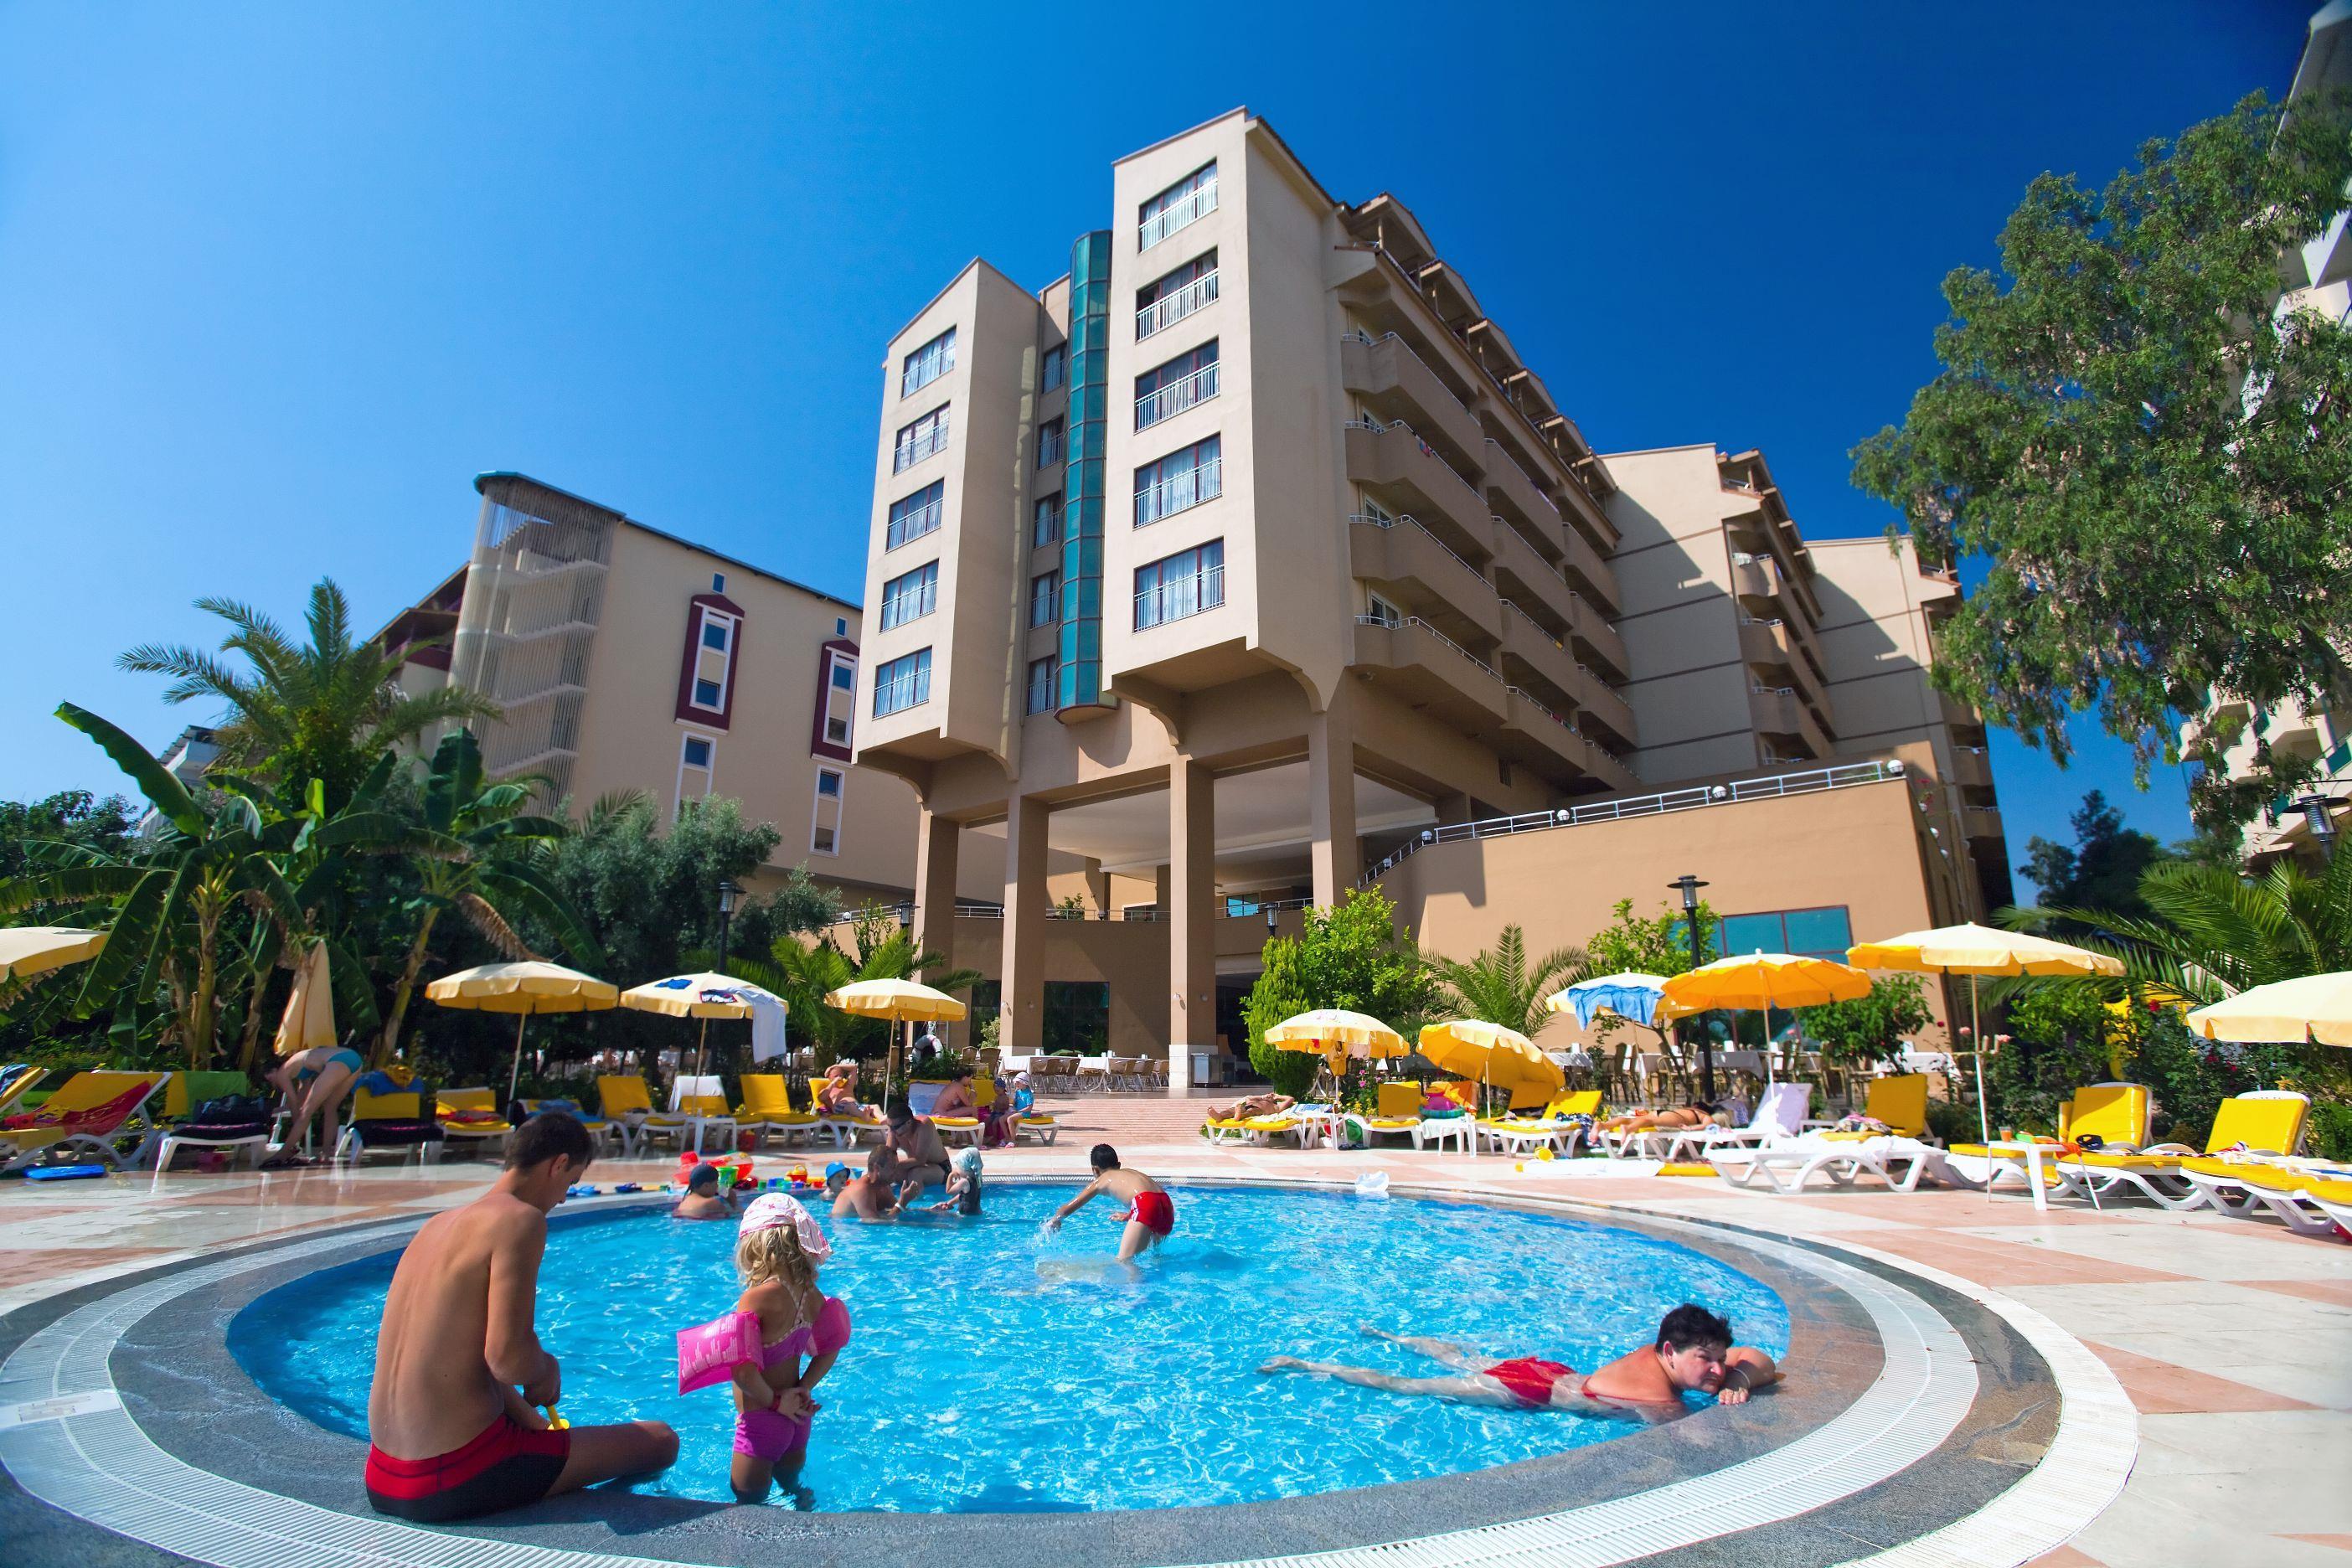 http://www.orextravel.sk/OREX/hotelphotos/stella-beach-hotel-alanya-general-004.jpg